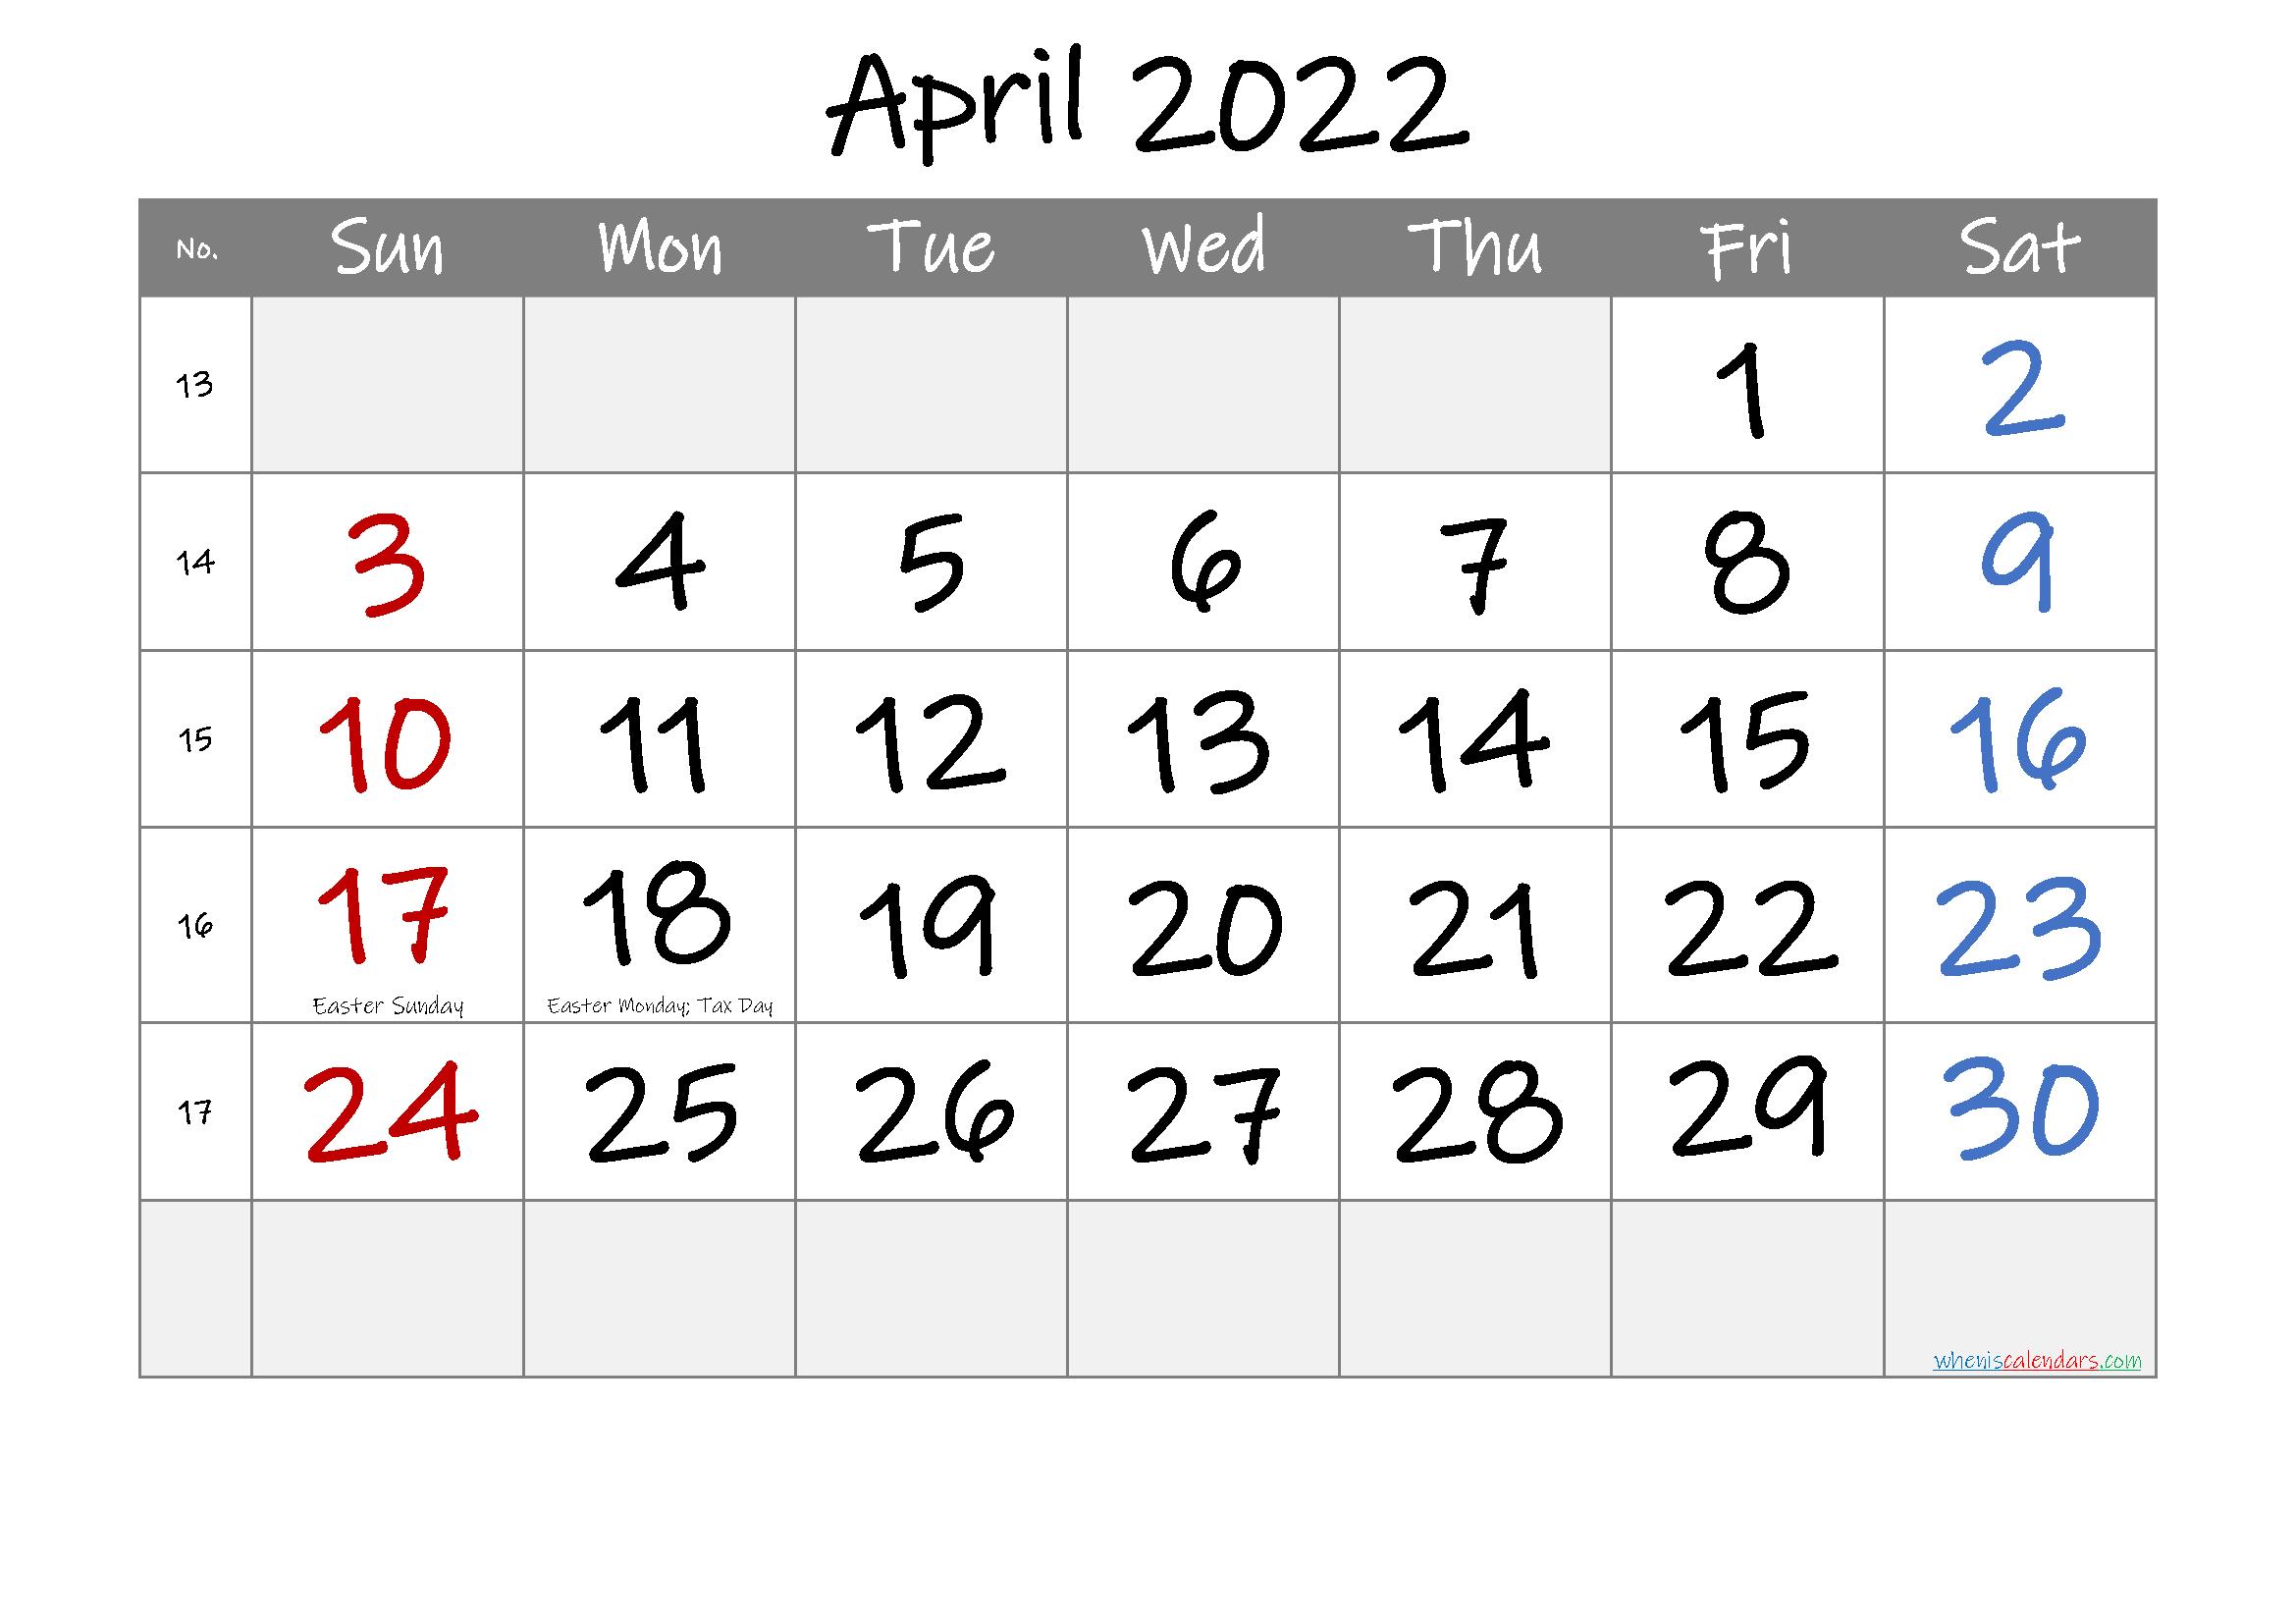 April 2022 Free Printable Calendar-Template No.if22M28 throughout Calendar April 2022 Printable Pdf Graphics